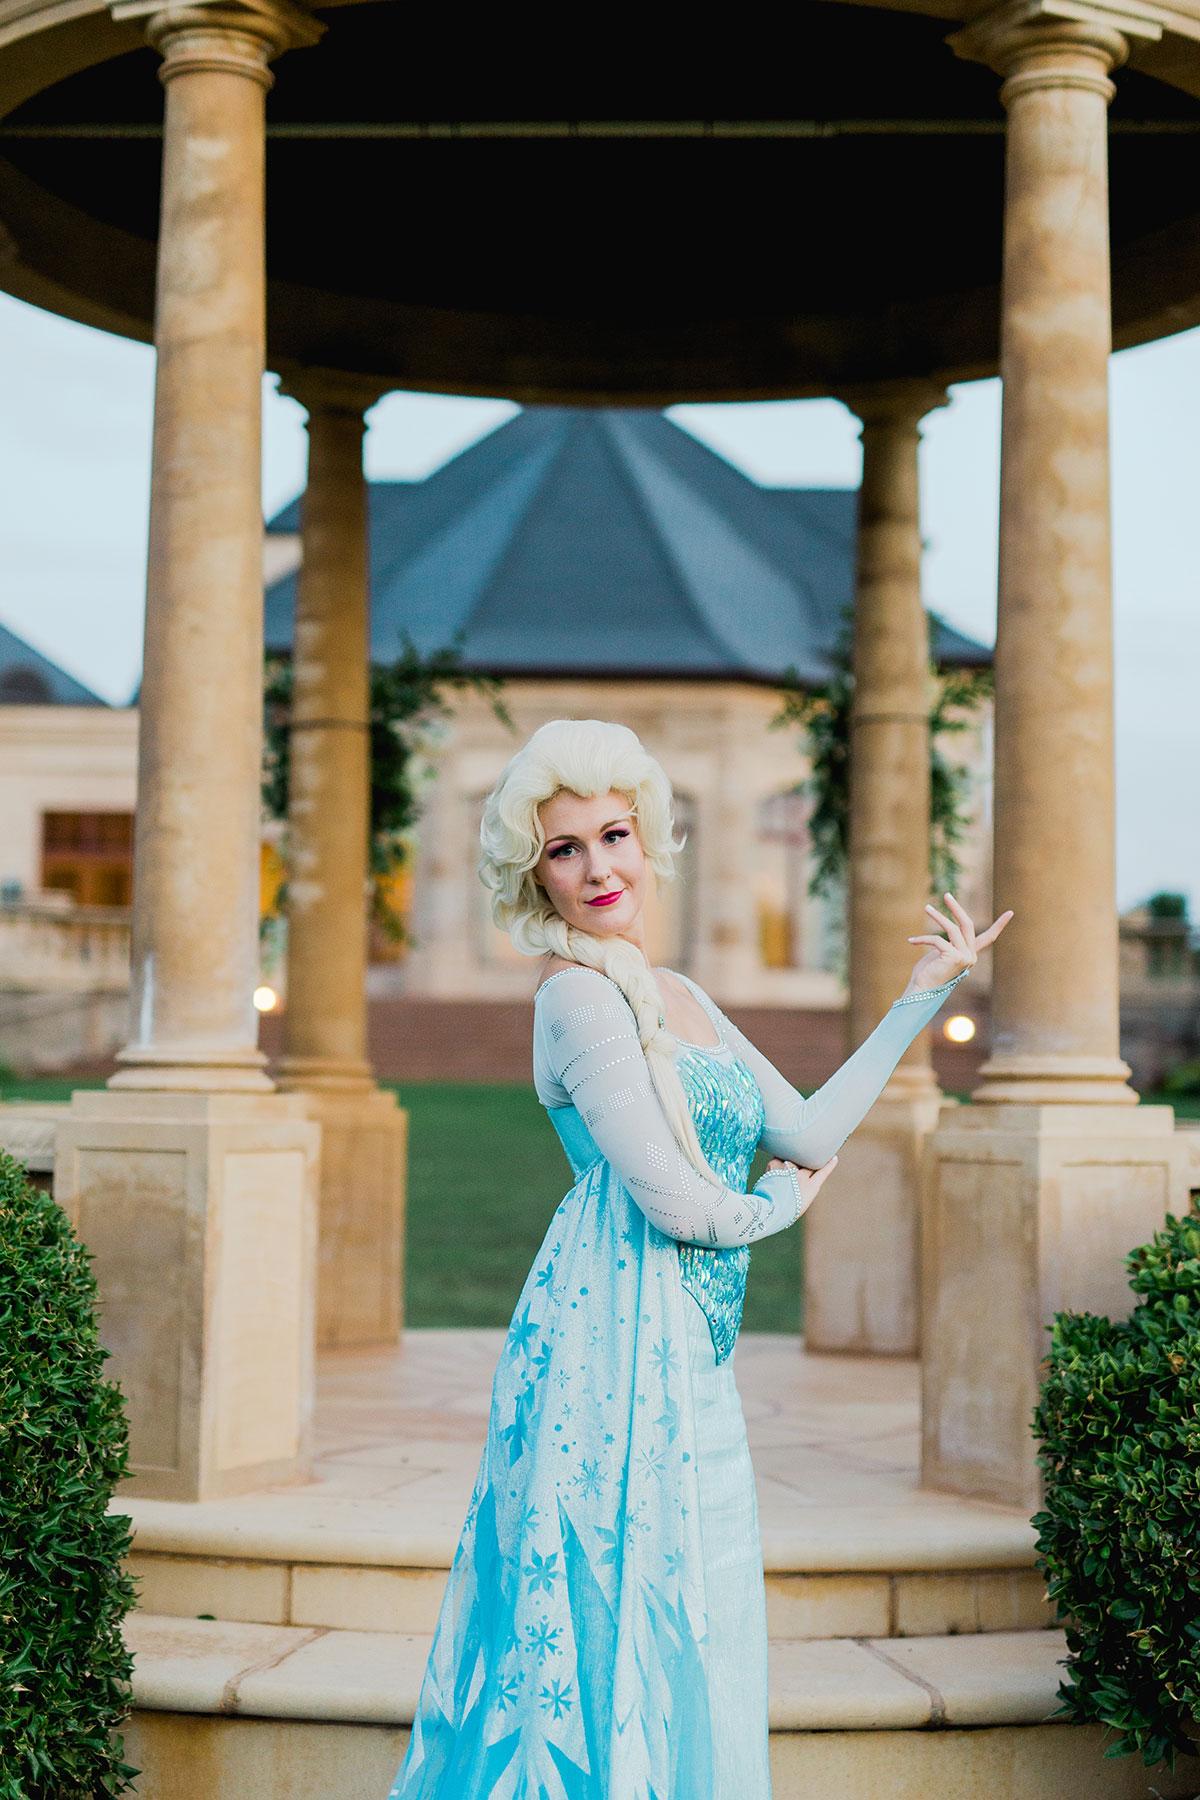 Elsa.jpg